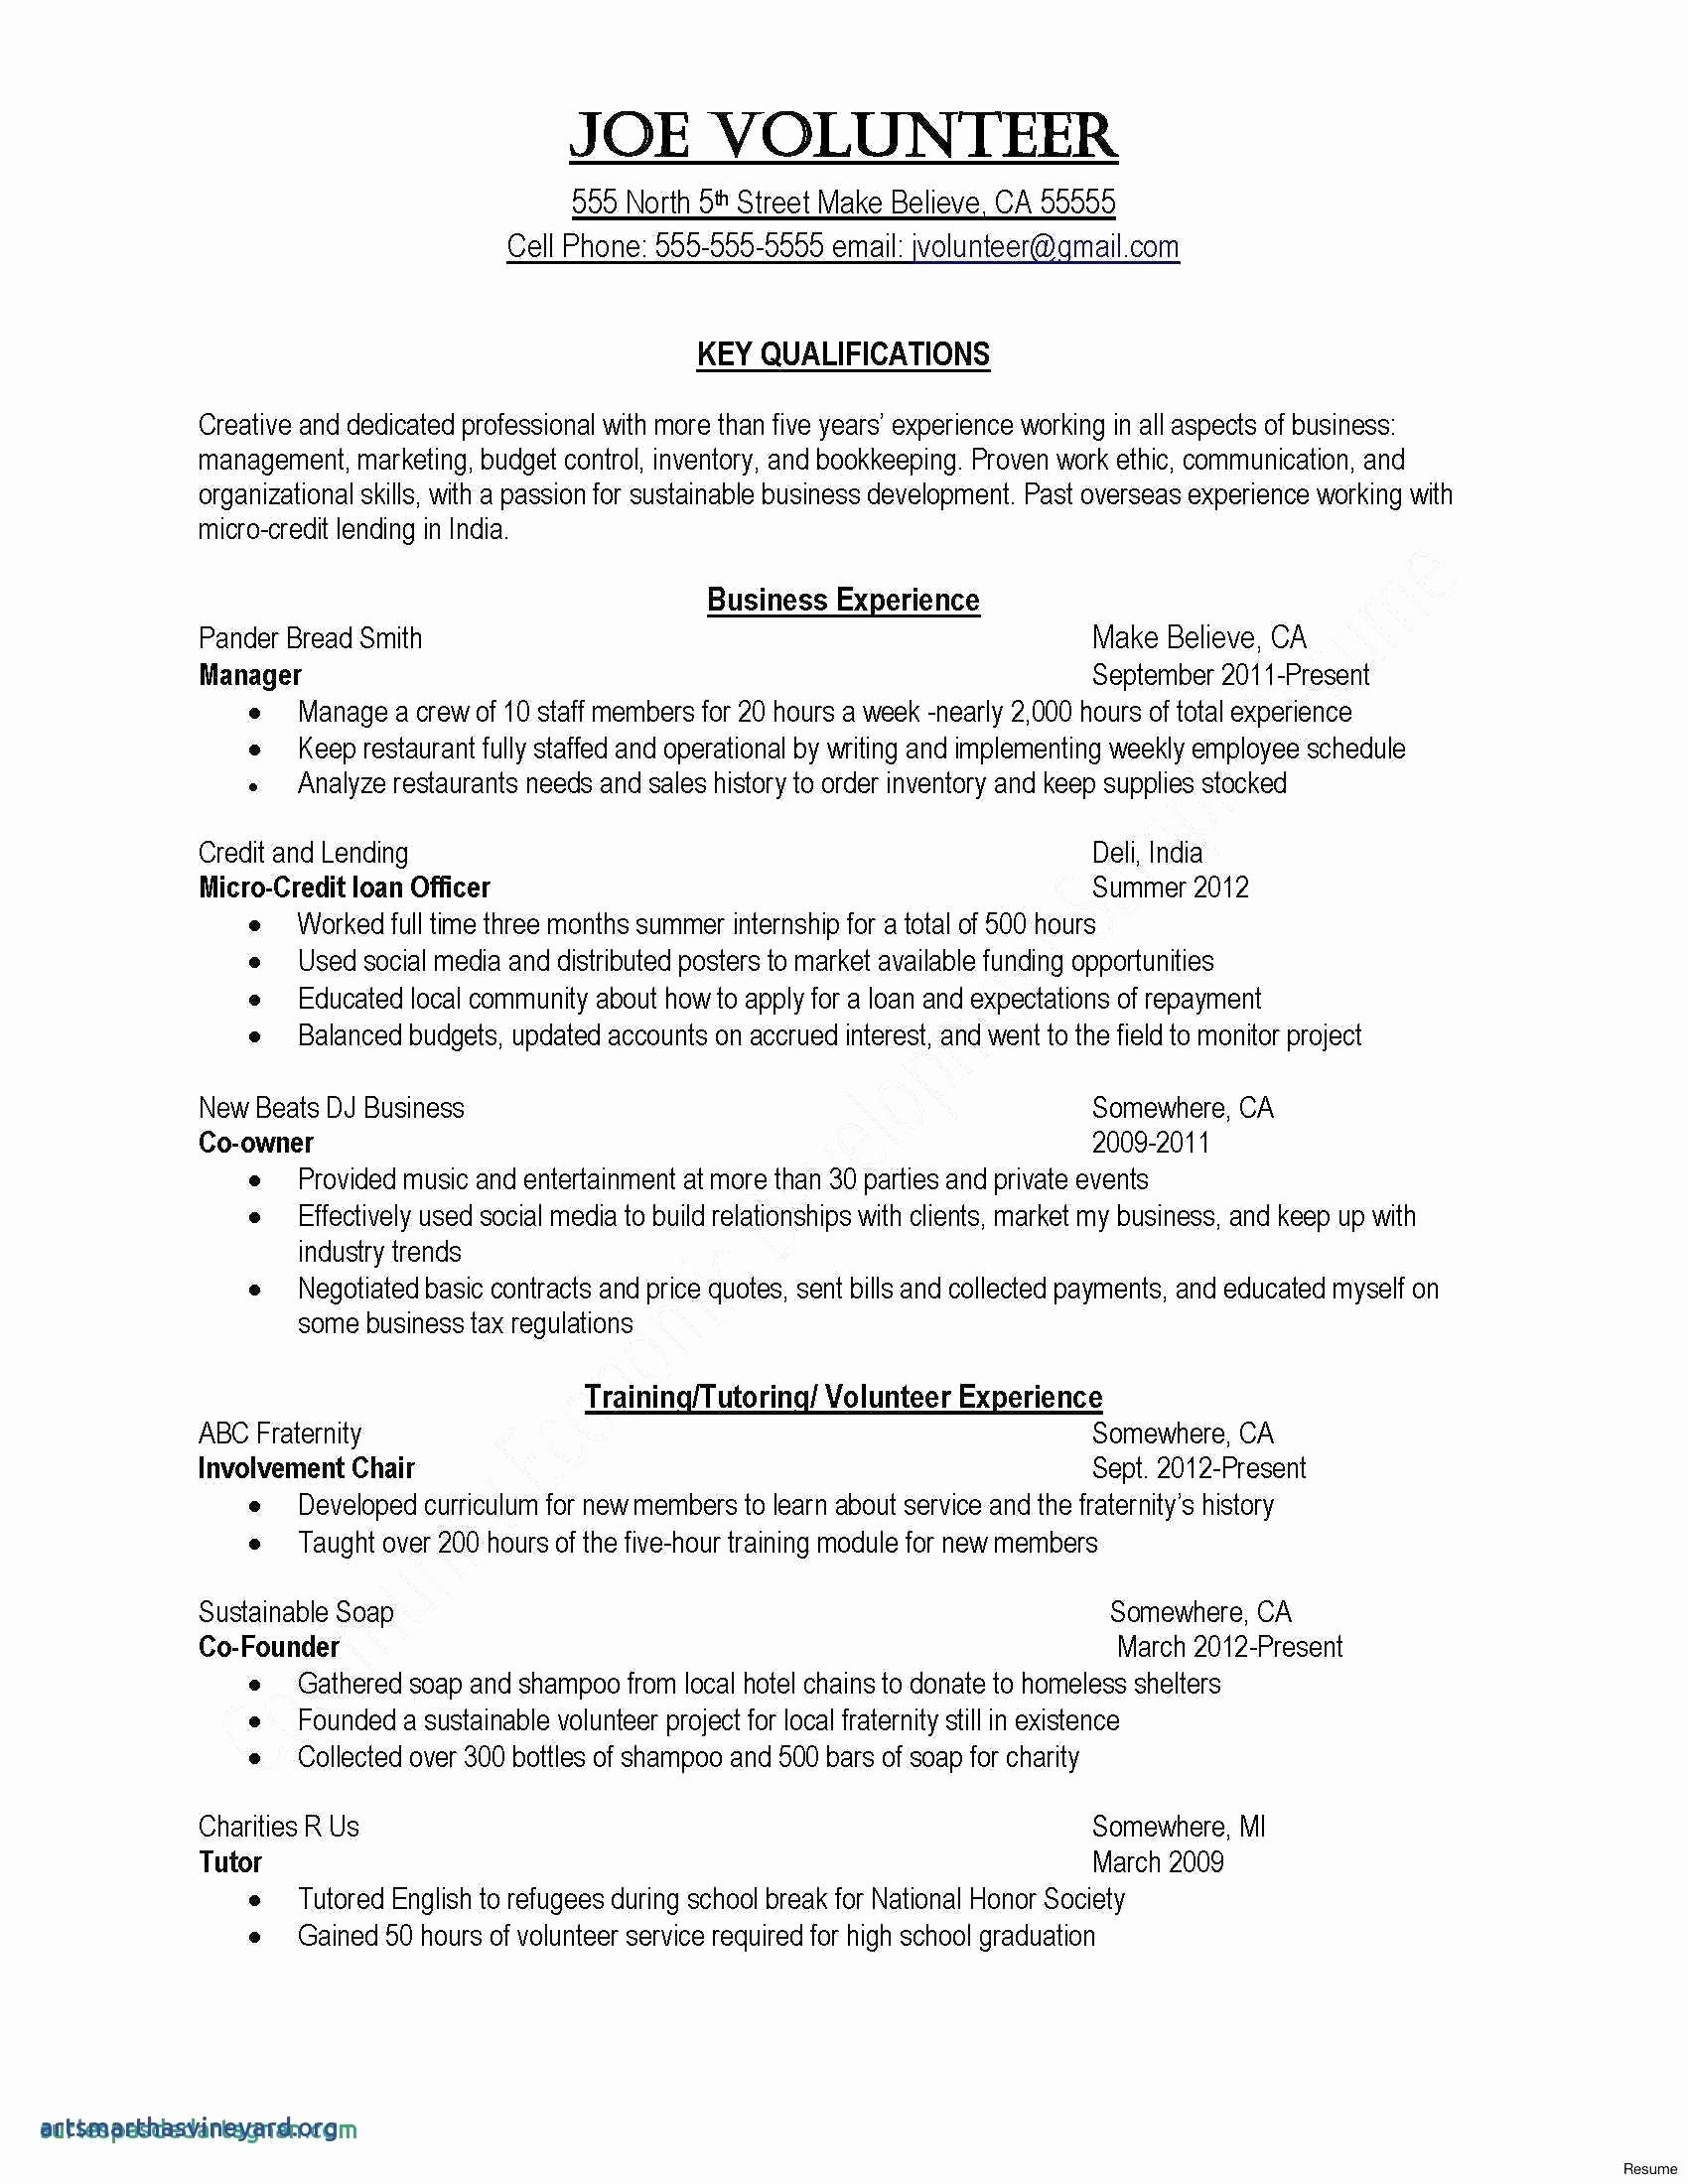 Excel Spreadsheet Workout Plan Inside Employee Training Log Template Fresh Weightlifting Excel Spreadsheet